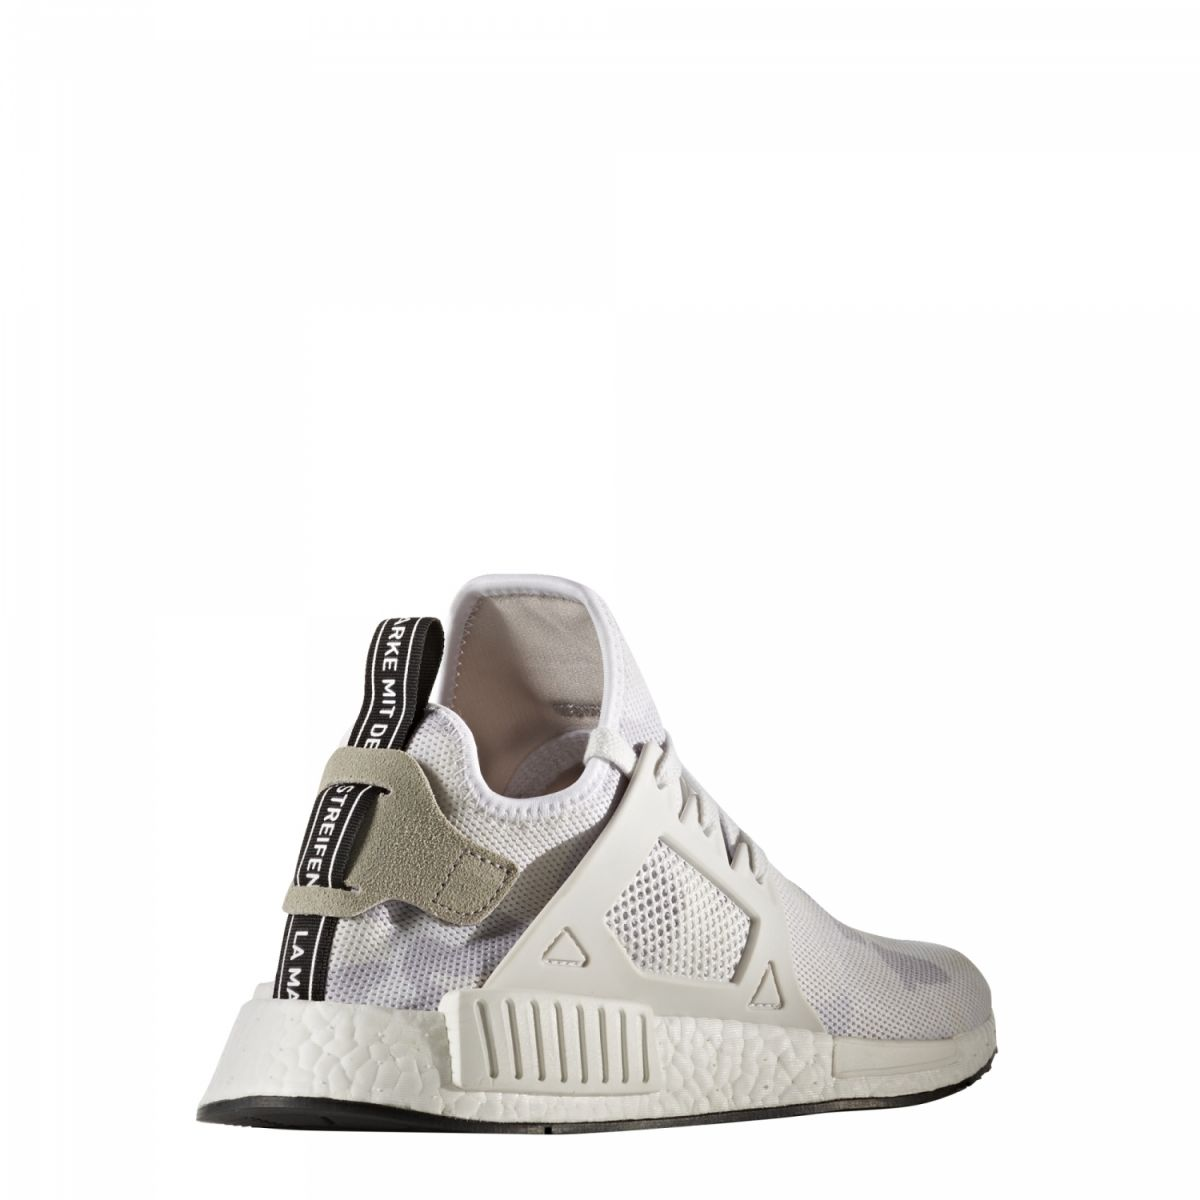 adidas originals nmd xr1 pk sneaker herren schuhe wei. Black Bedroom Furniture Sets. Home Design Ideas